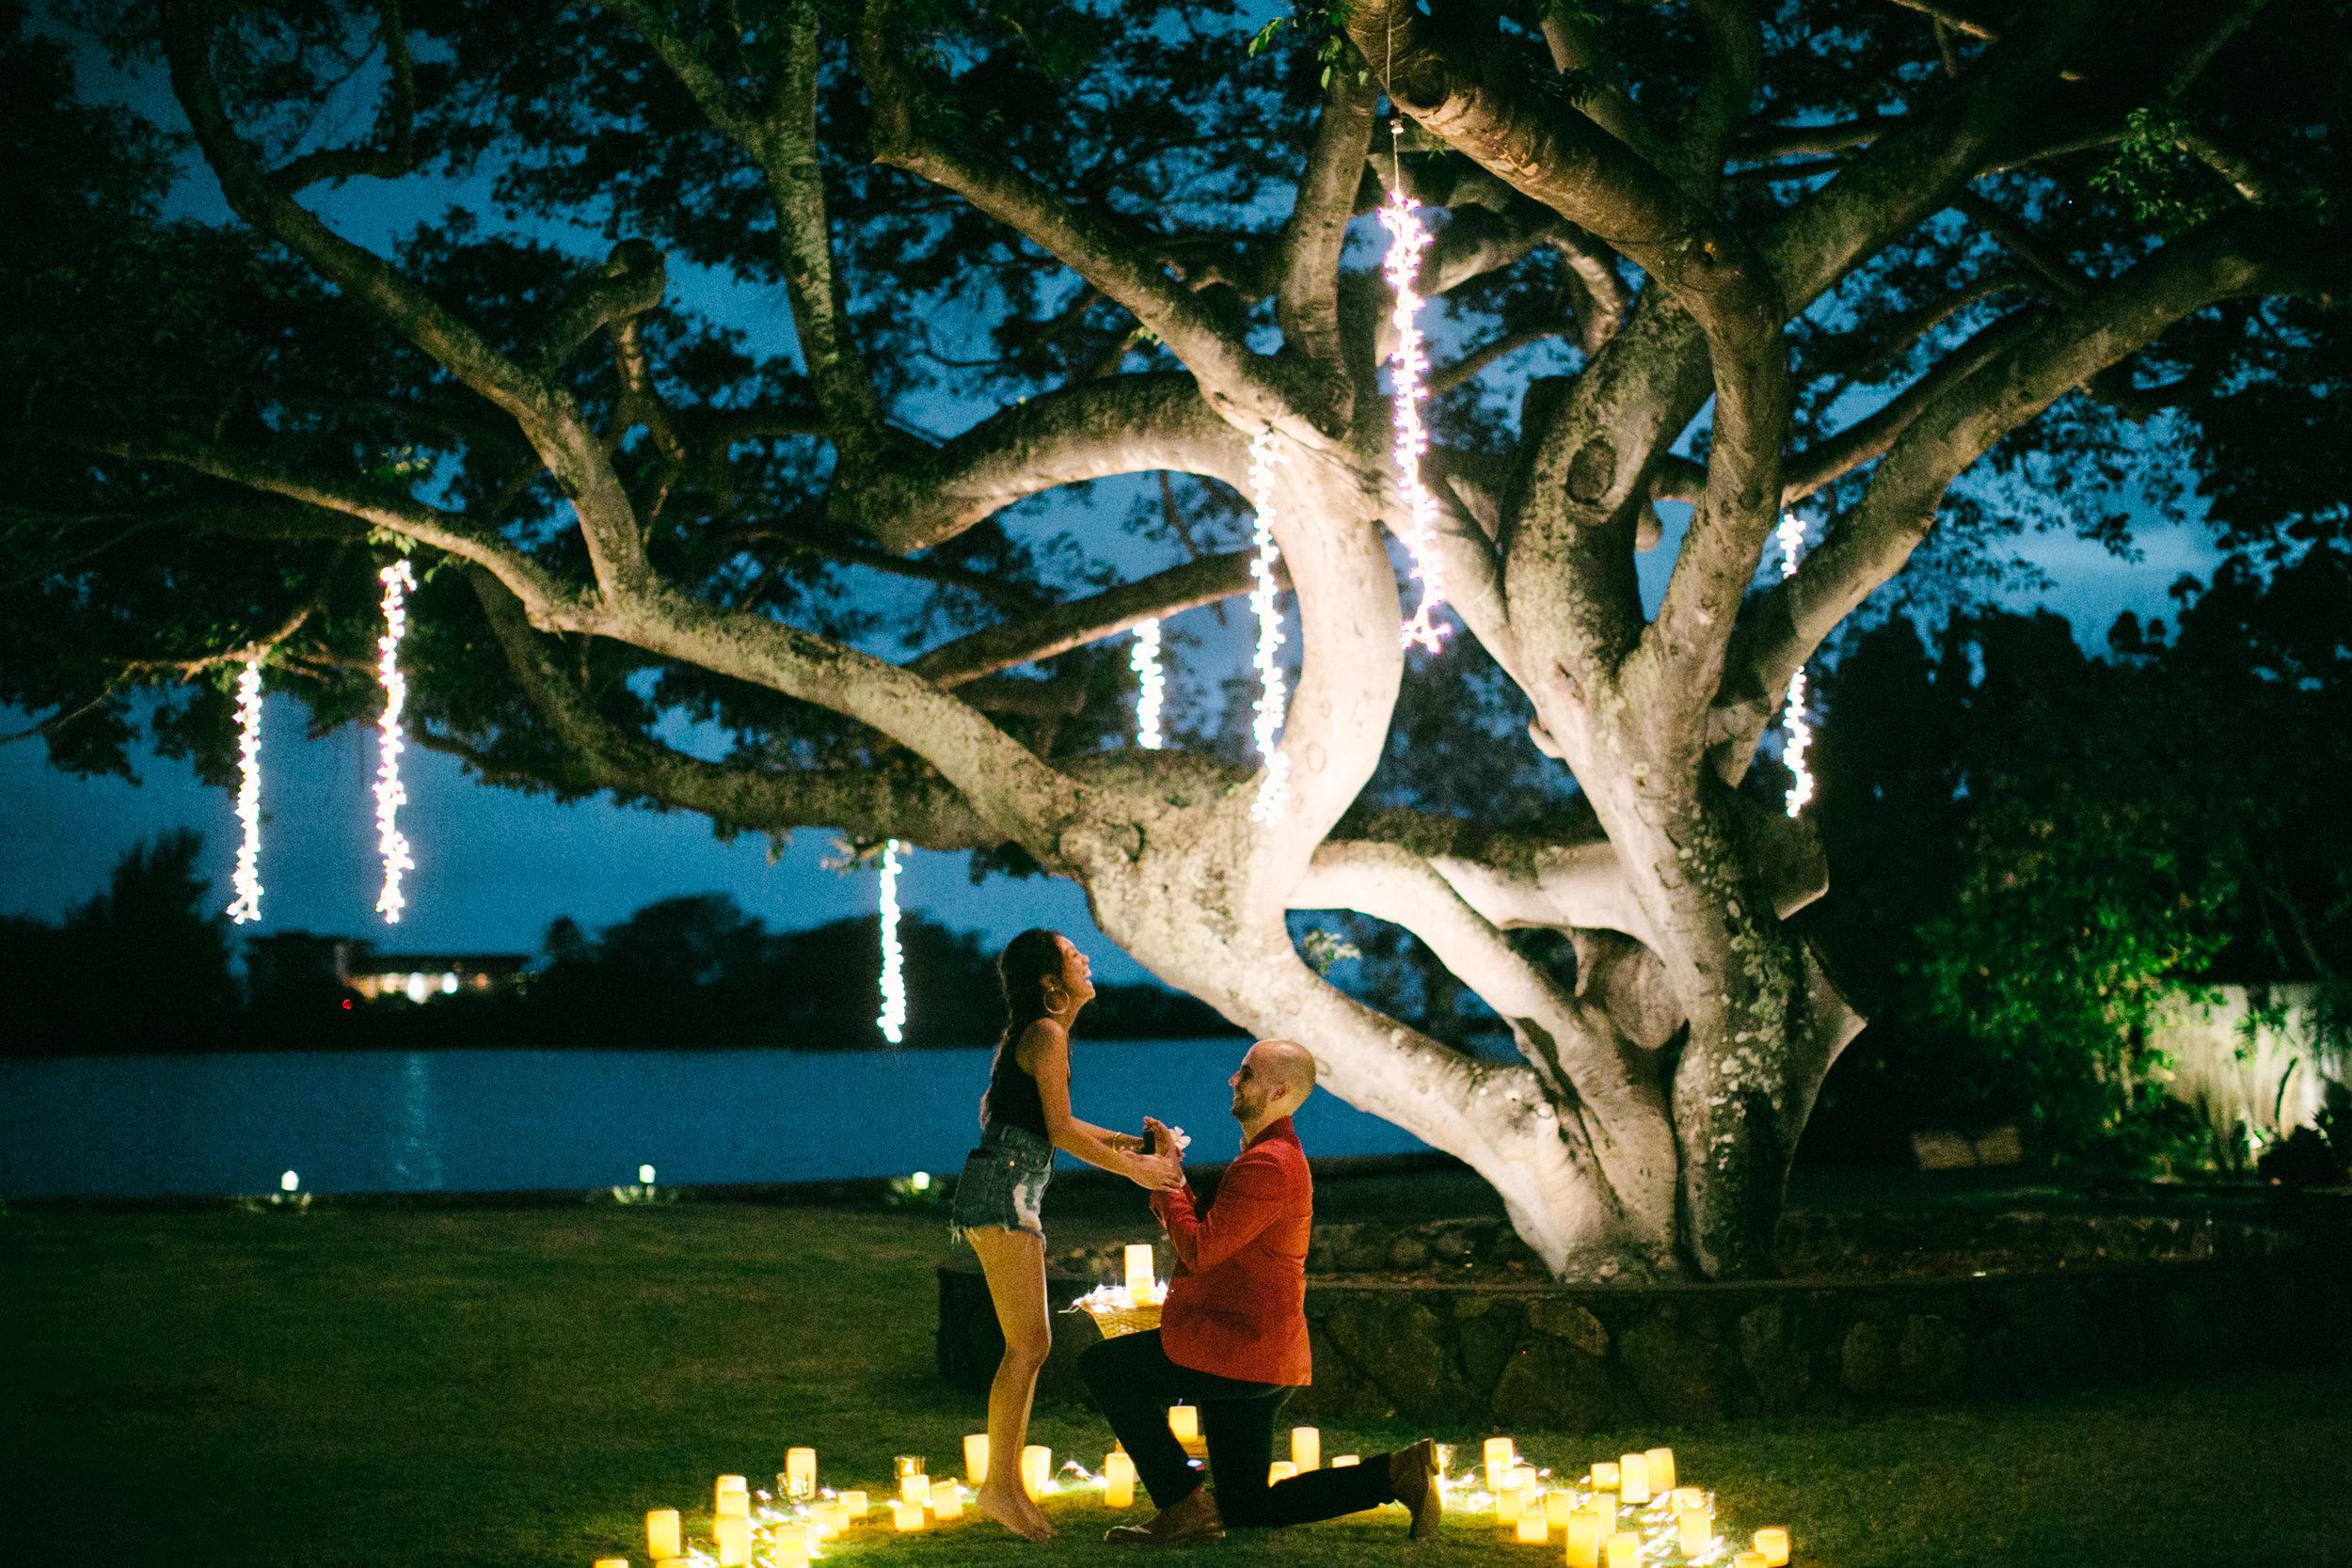 Kalani proposes to Joyce